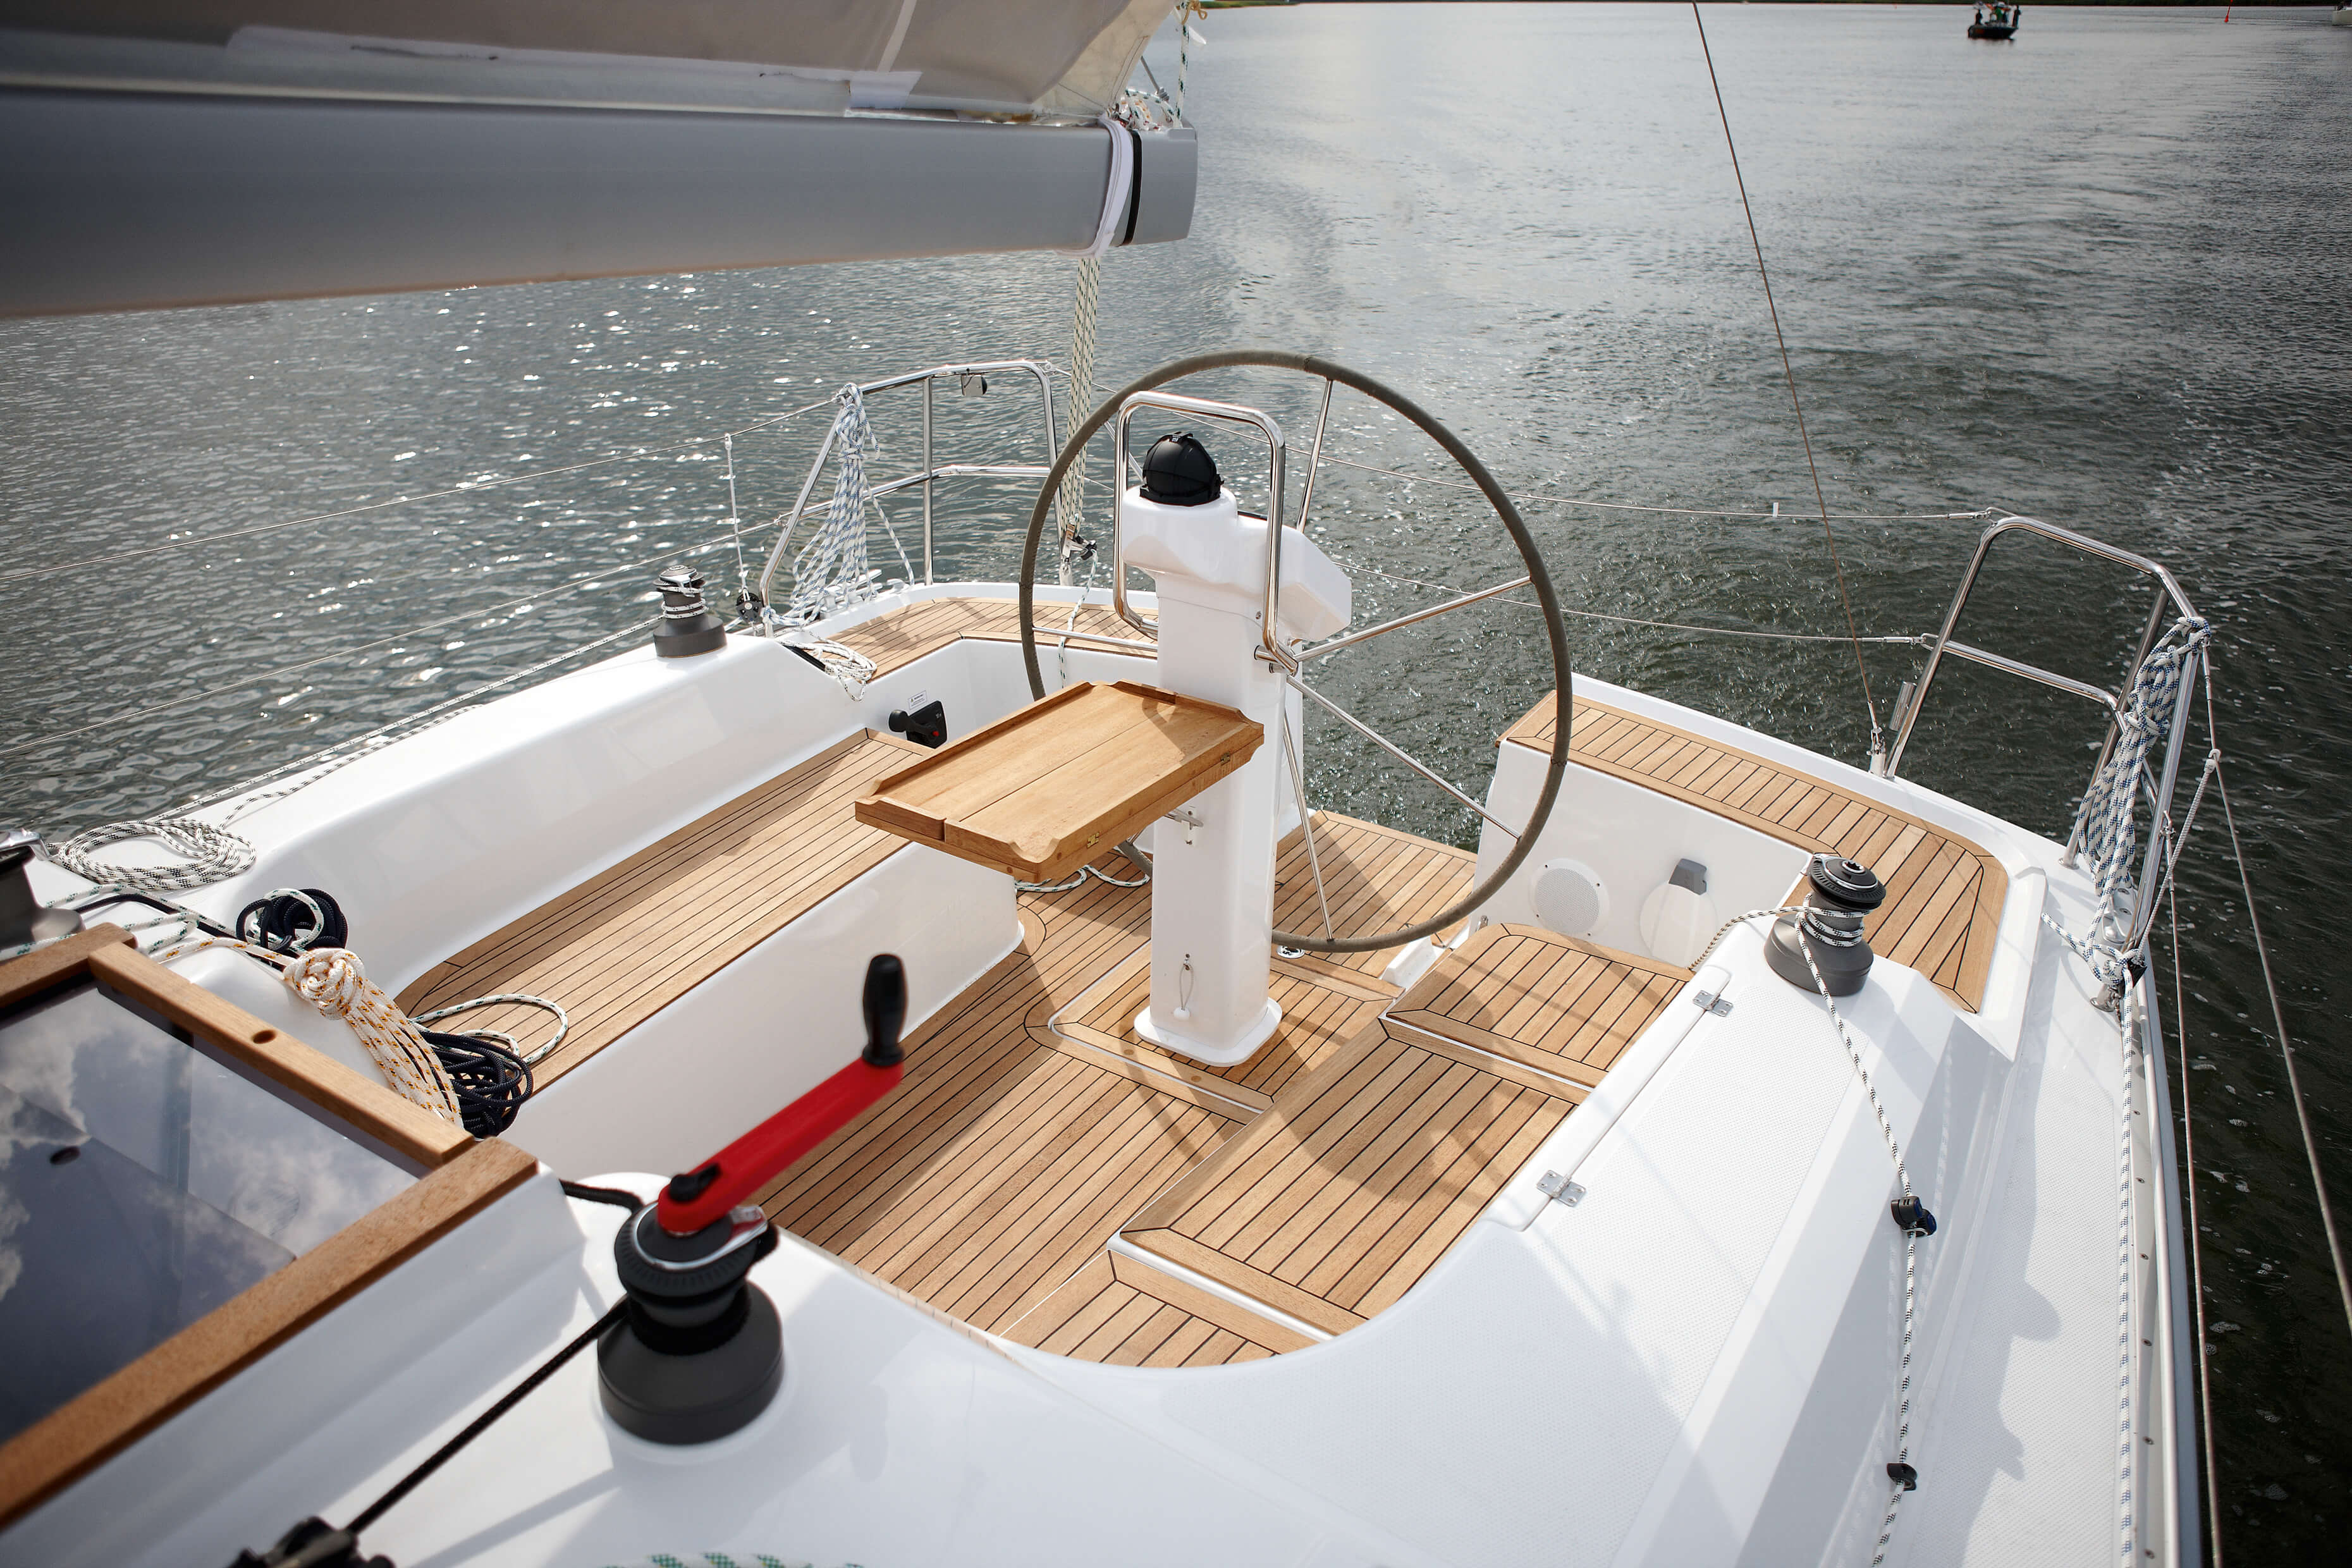 Hanse 355 Exterior at anchor | cockpit, steering wheel | Hanse